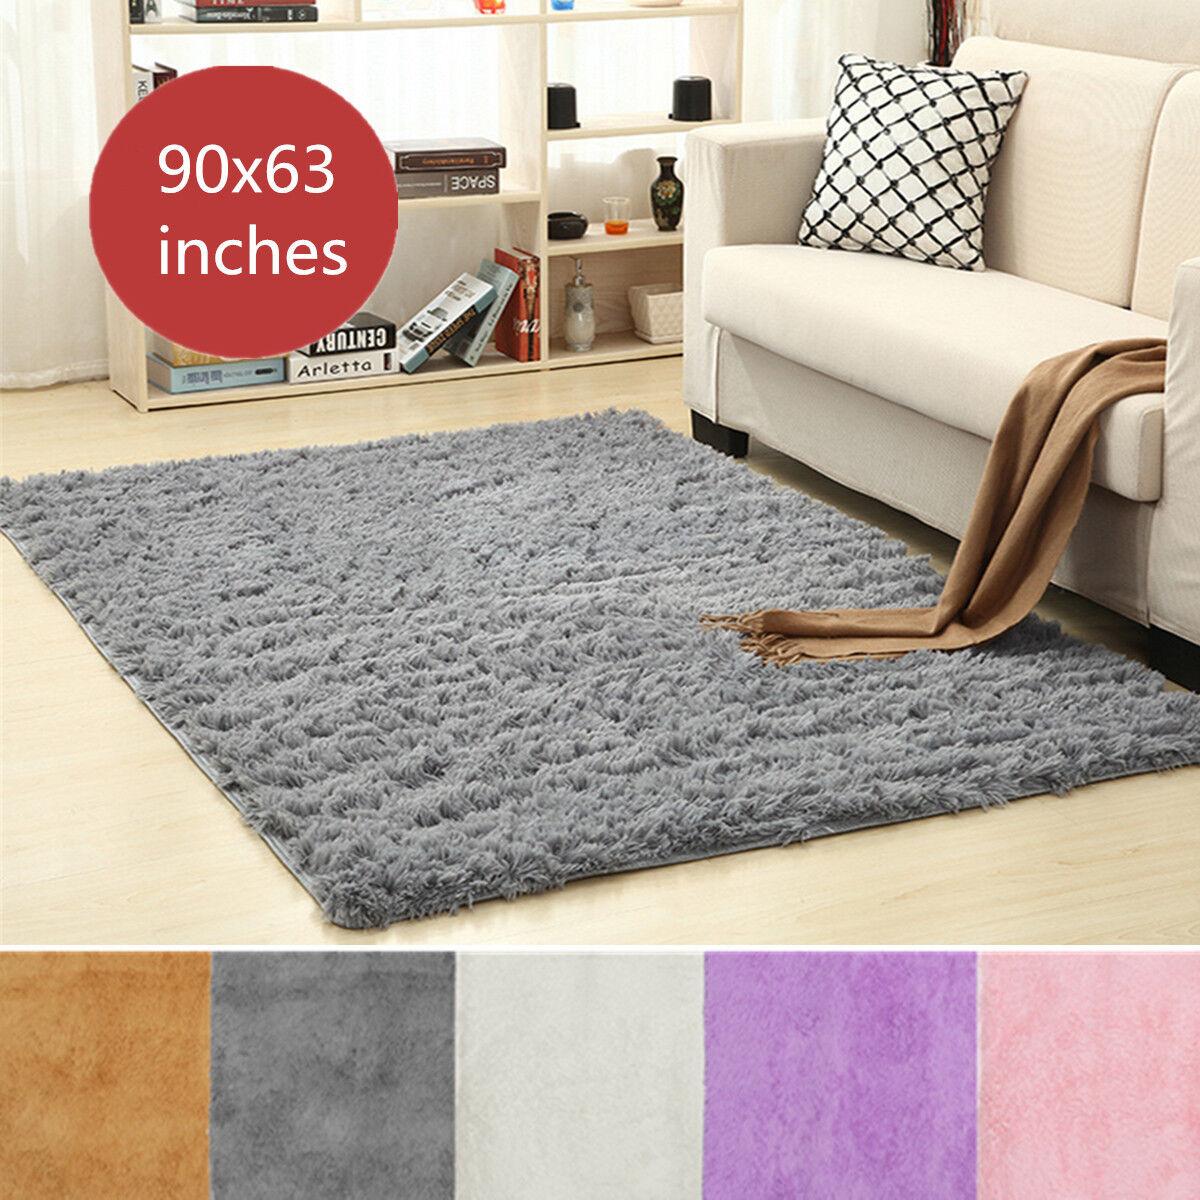 Floor Rugs Anti-Skid Shaggy Area Rug Dining Living Room Home